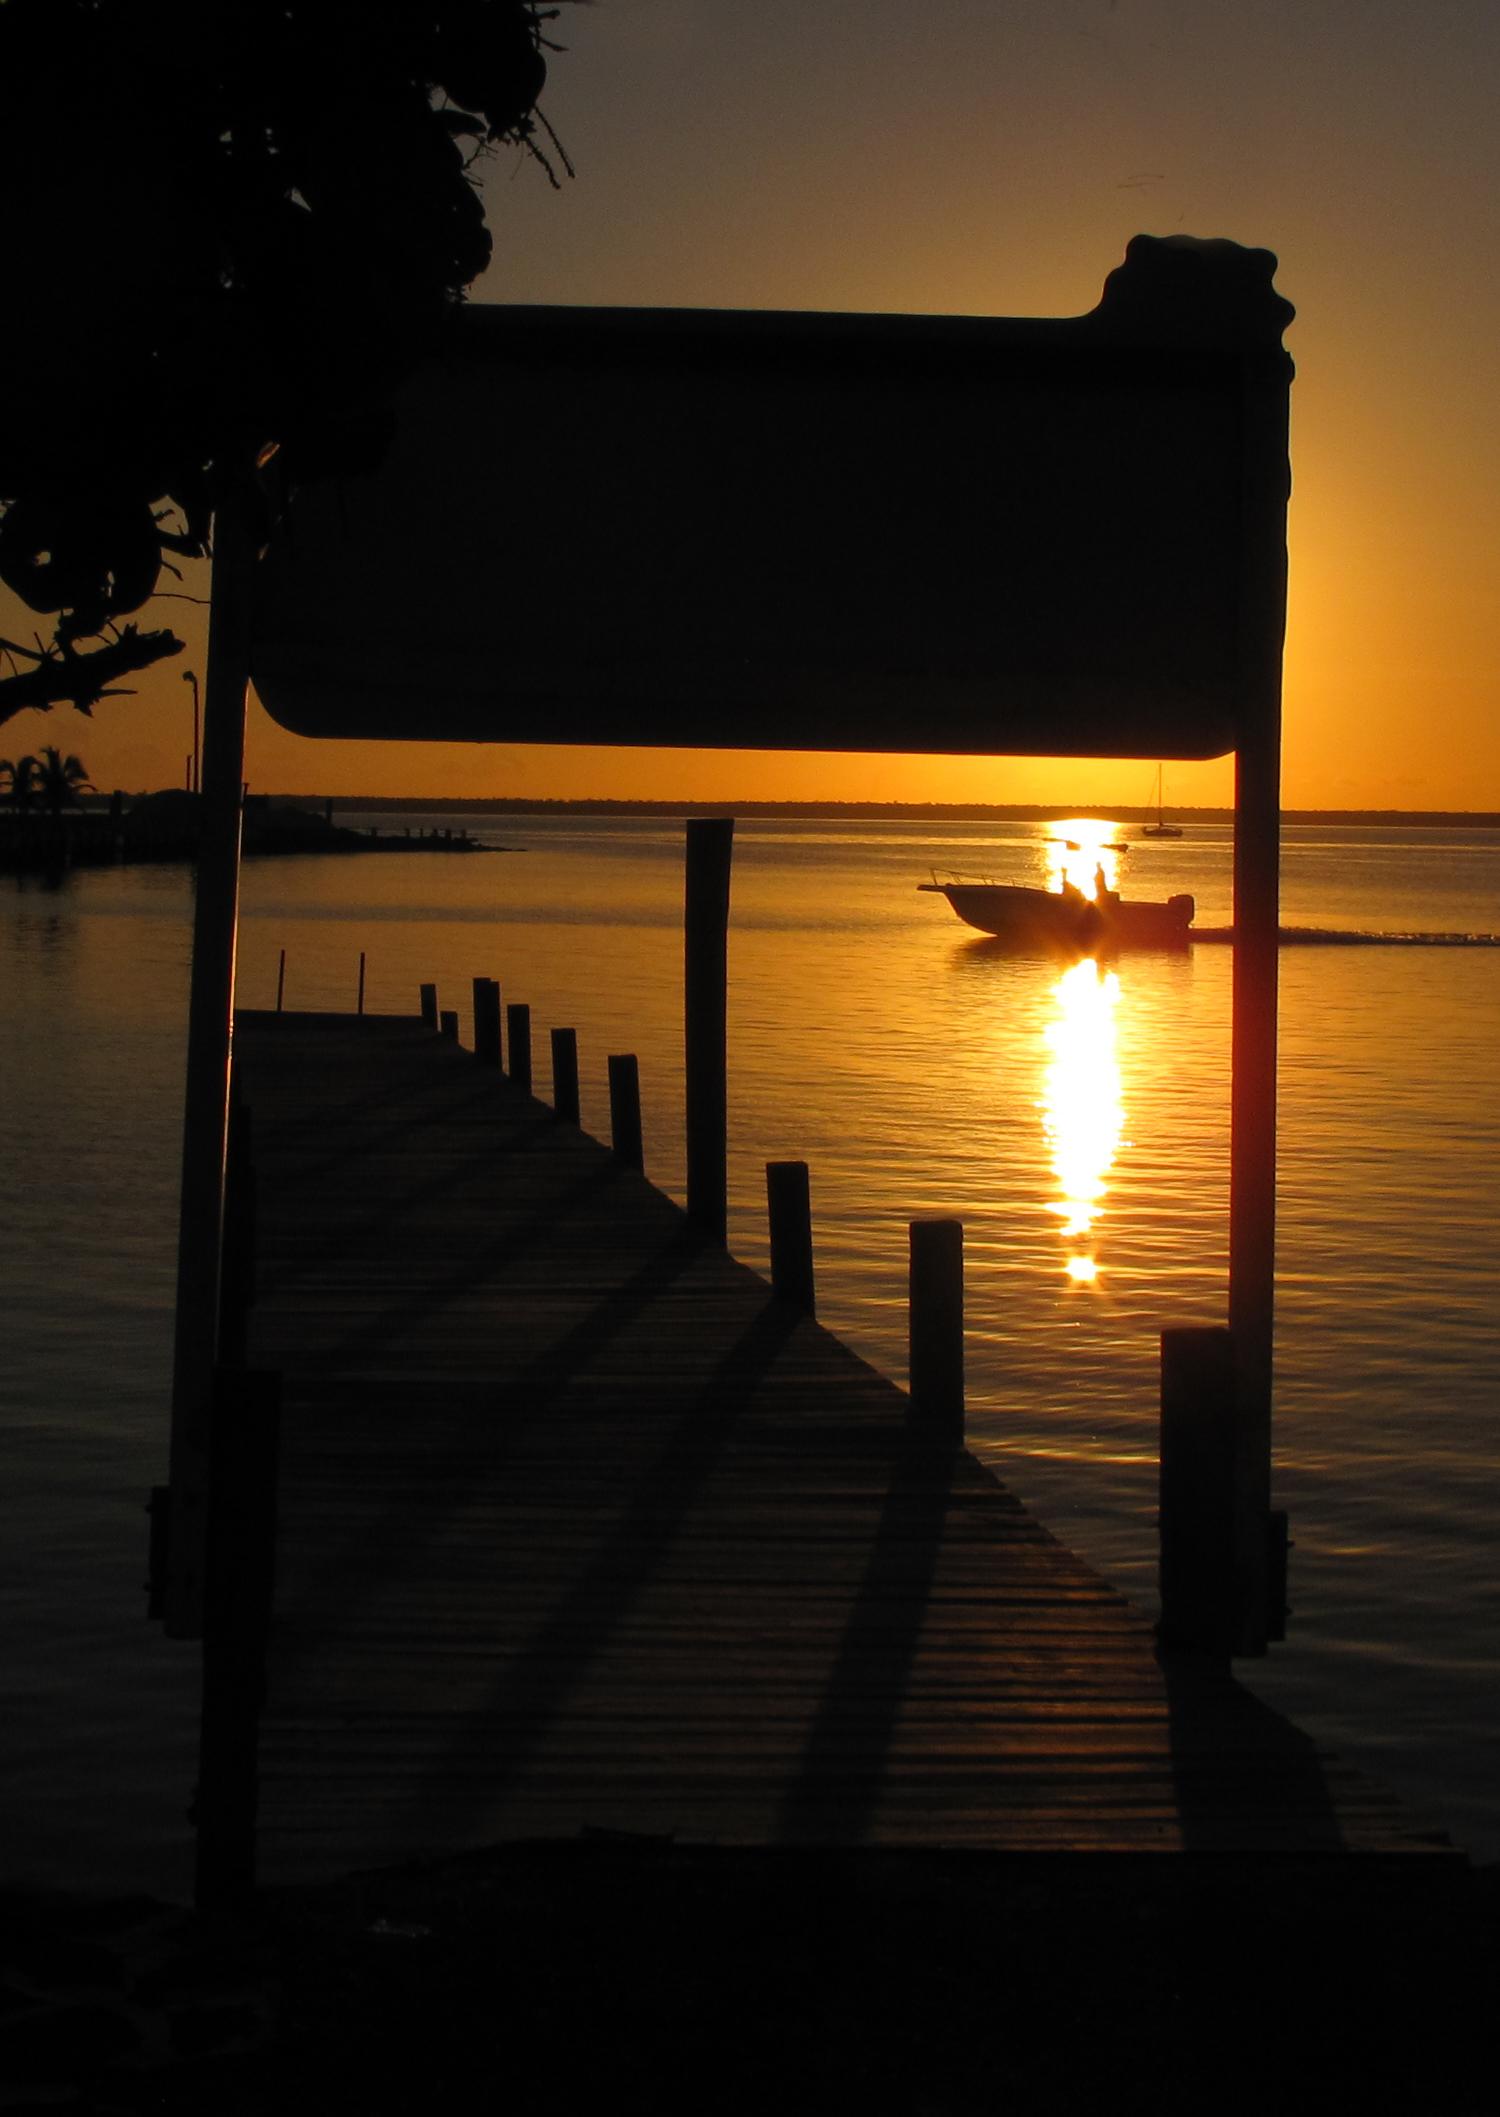 abaco, green turtle cay, bahamas, sunset